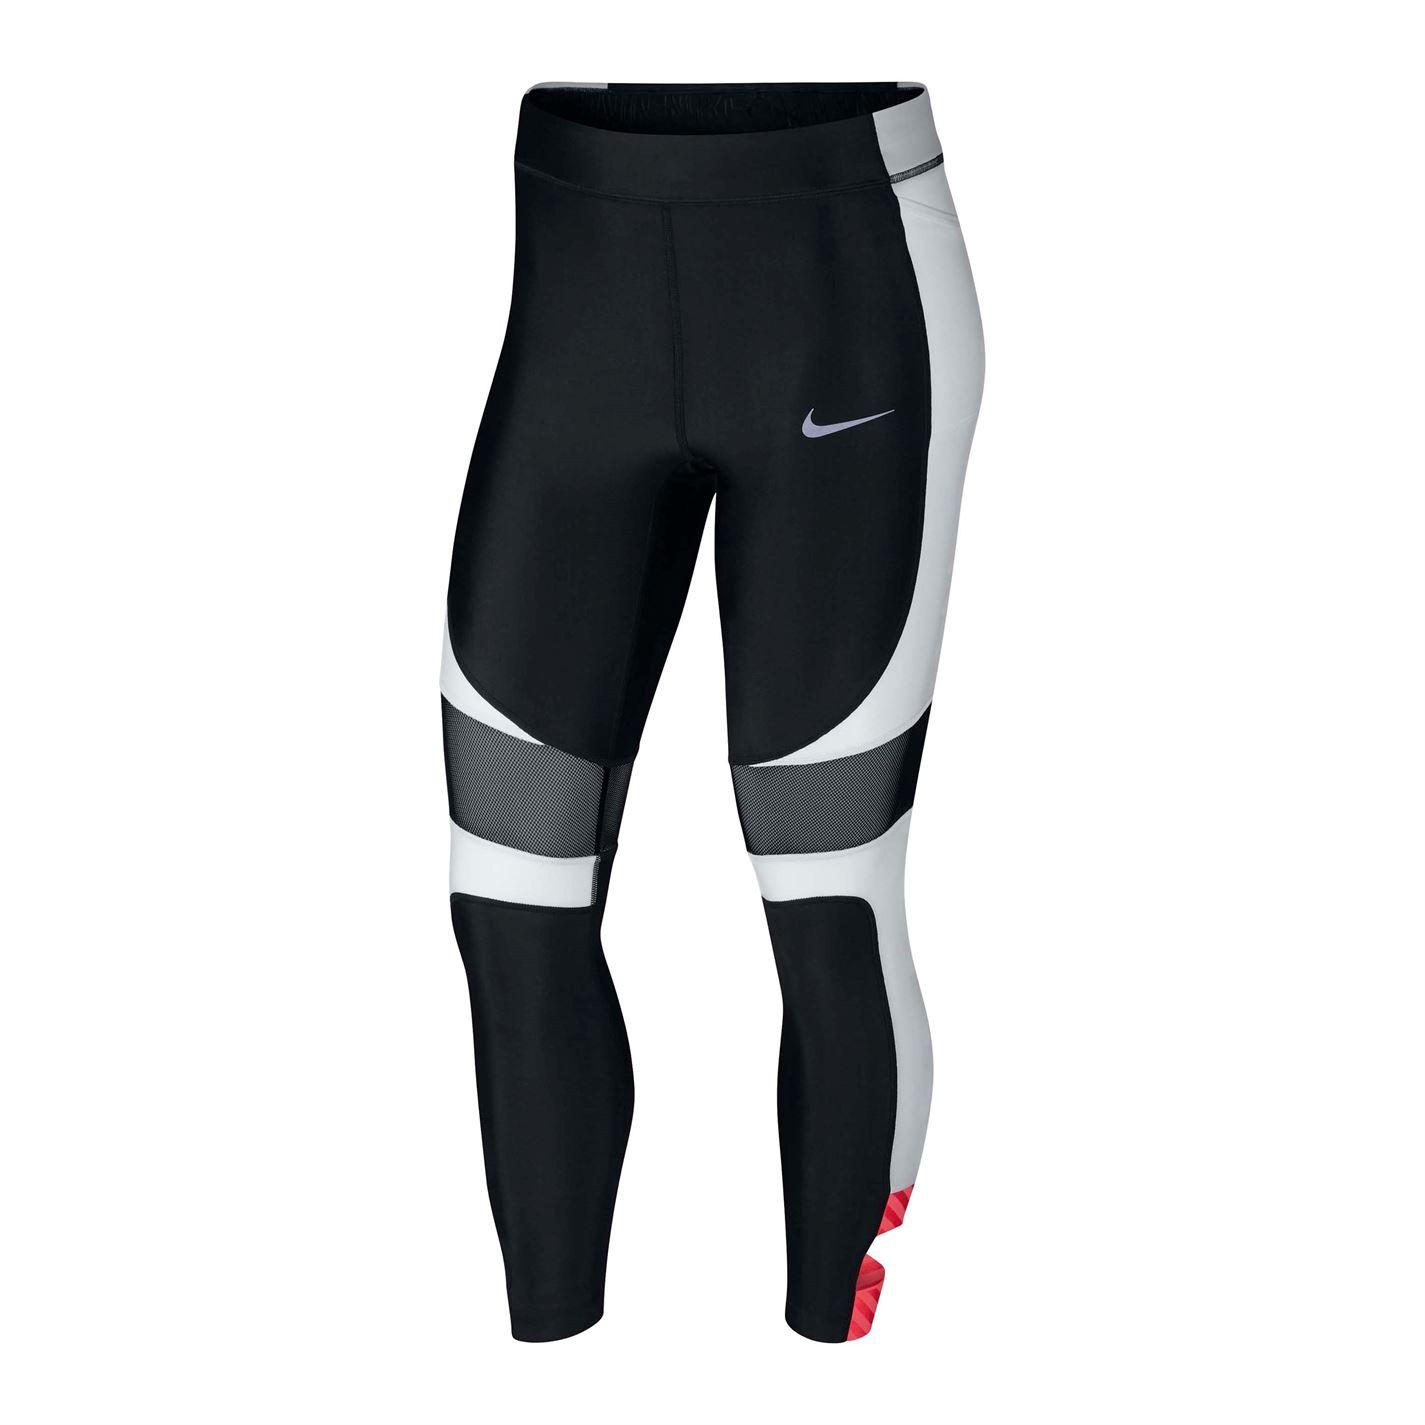 Nike 7 8 Speed Tights dámské